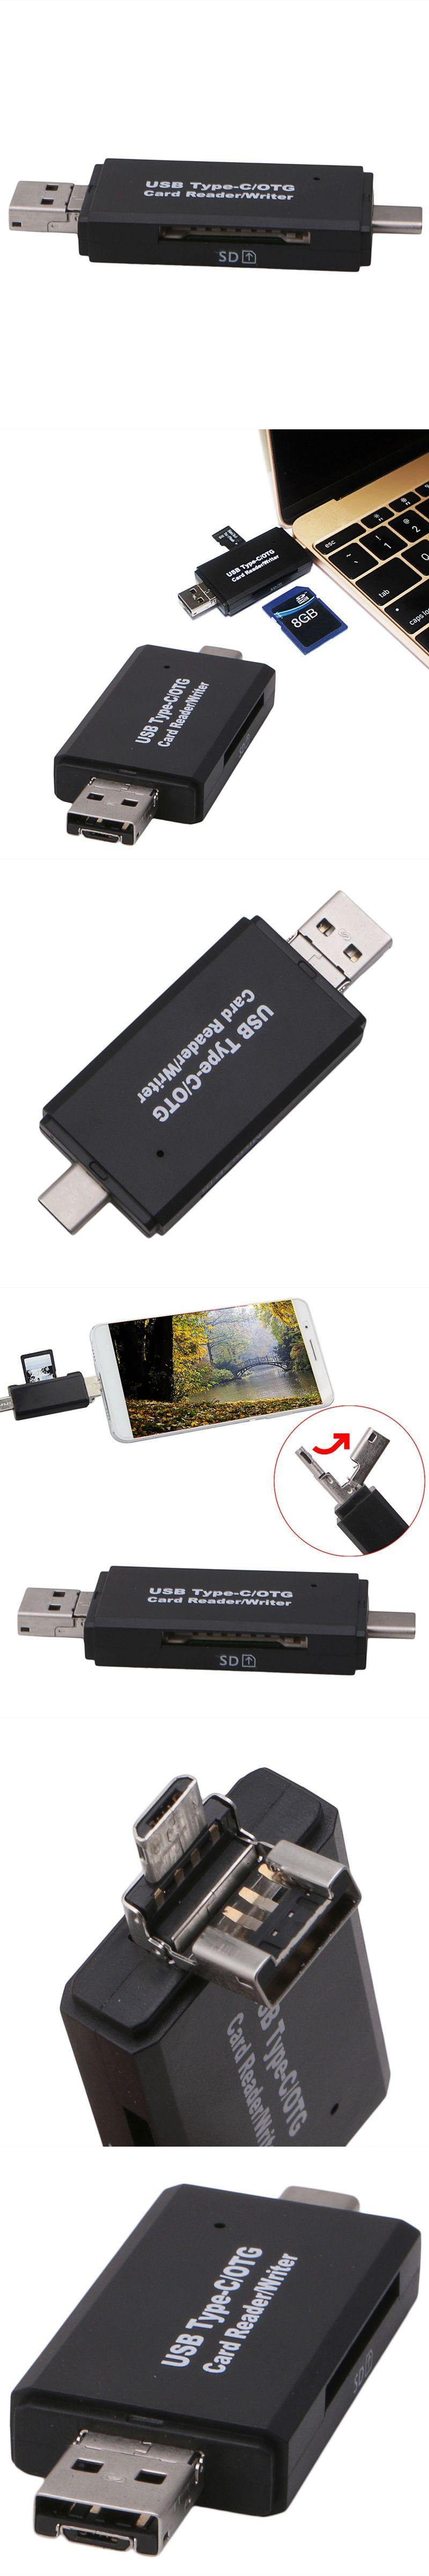 OOTDTY Multi Function Card Reader USB C Type C USB Micro USB